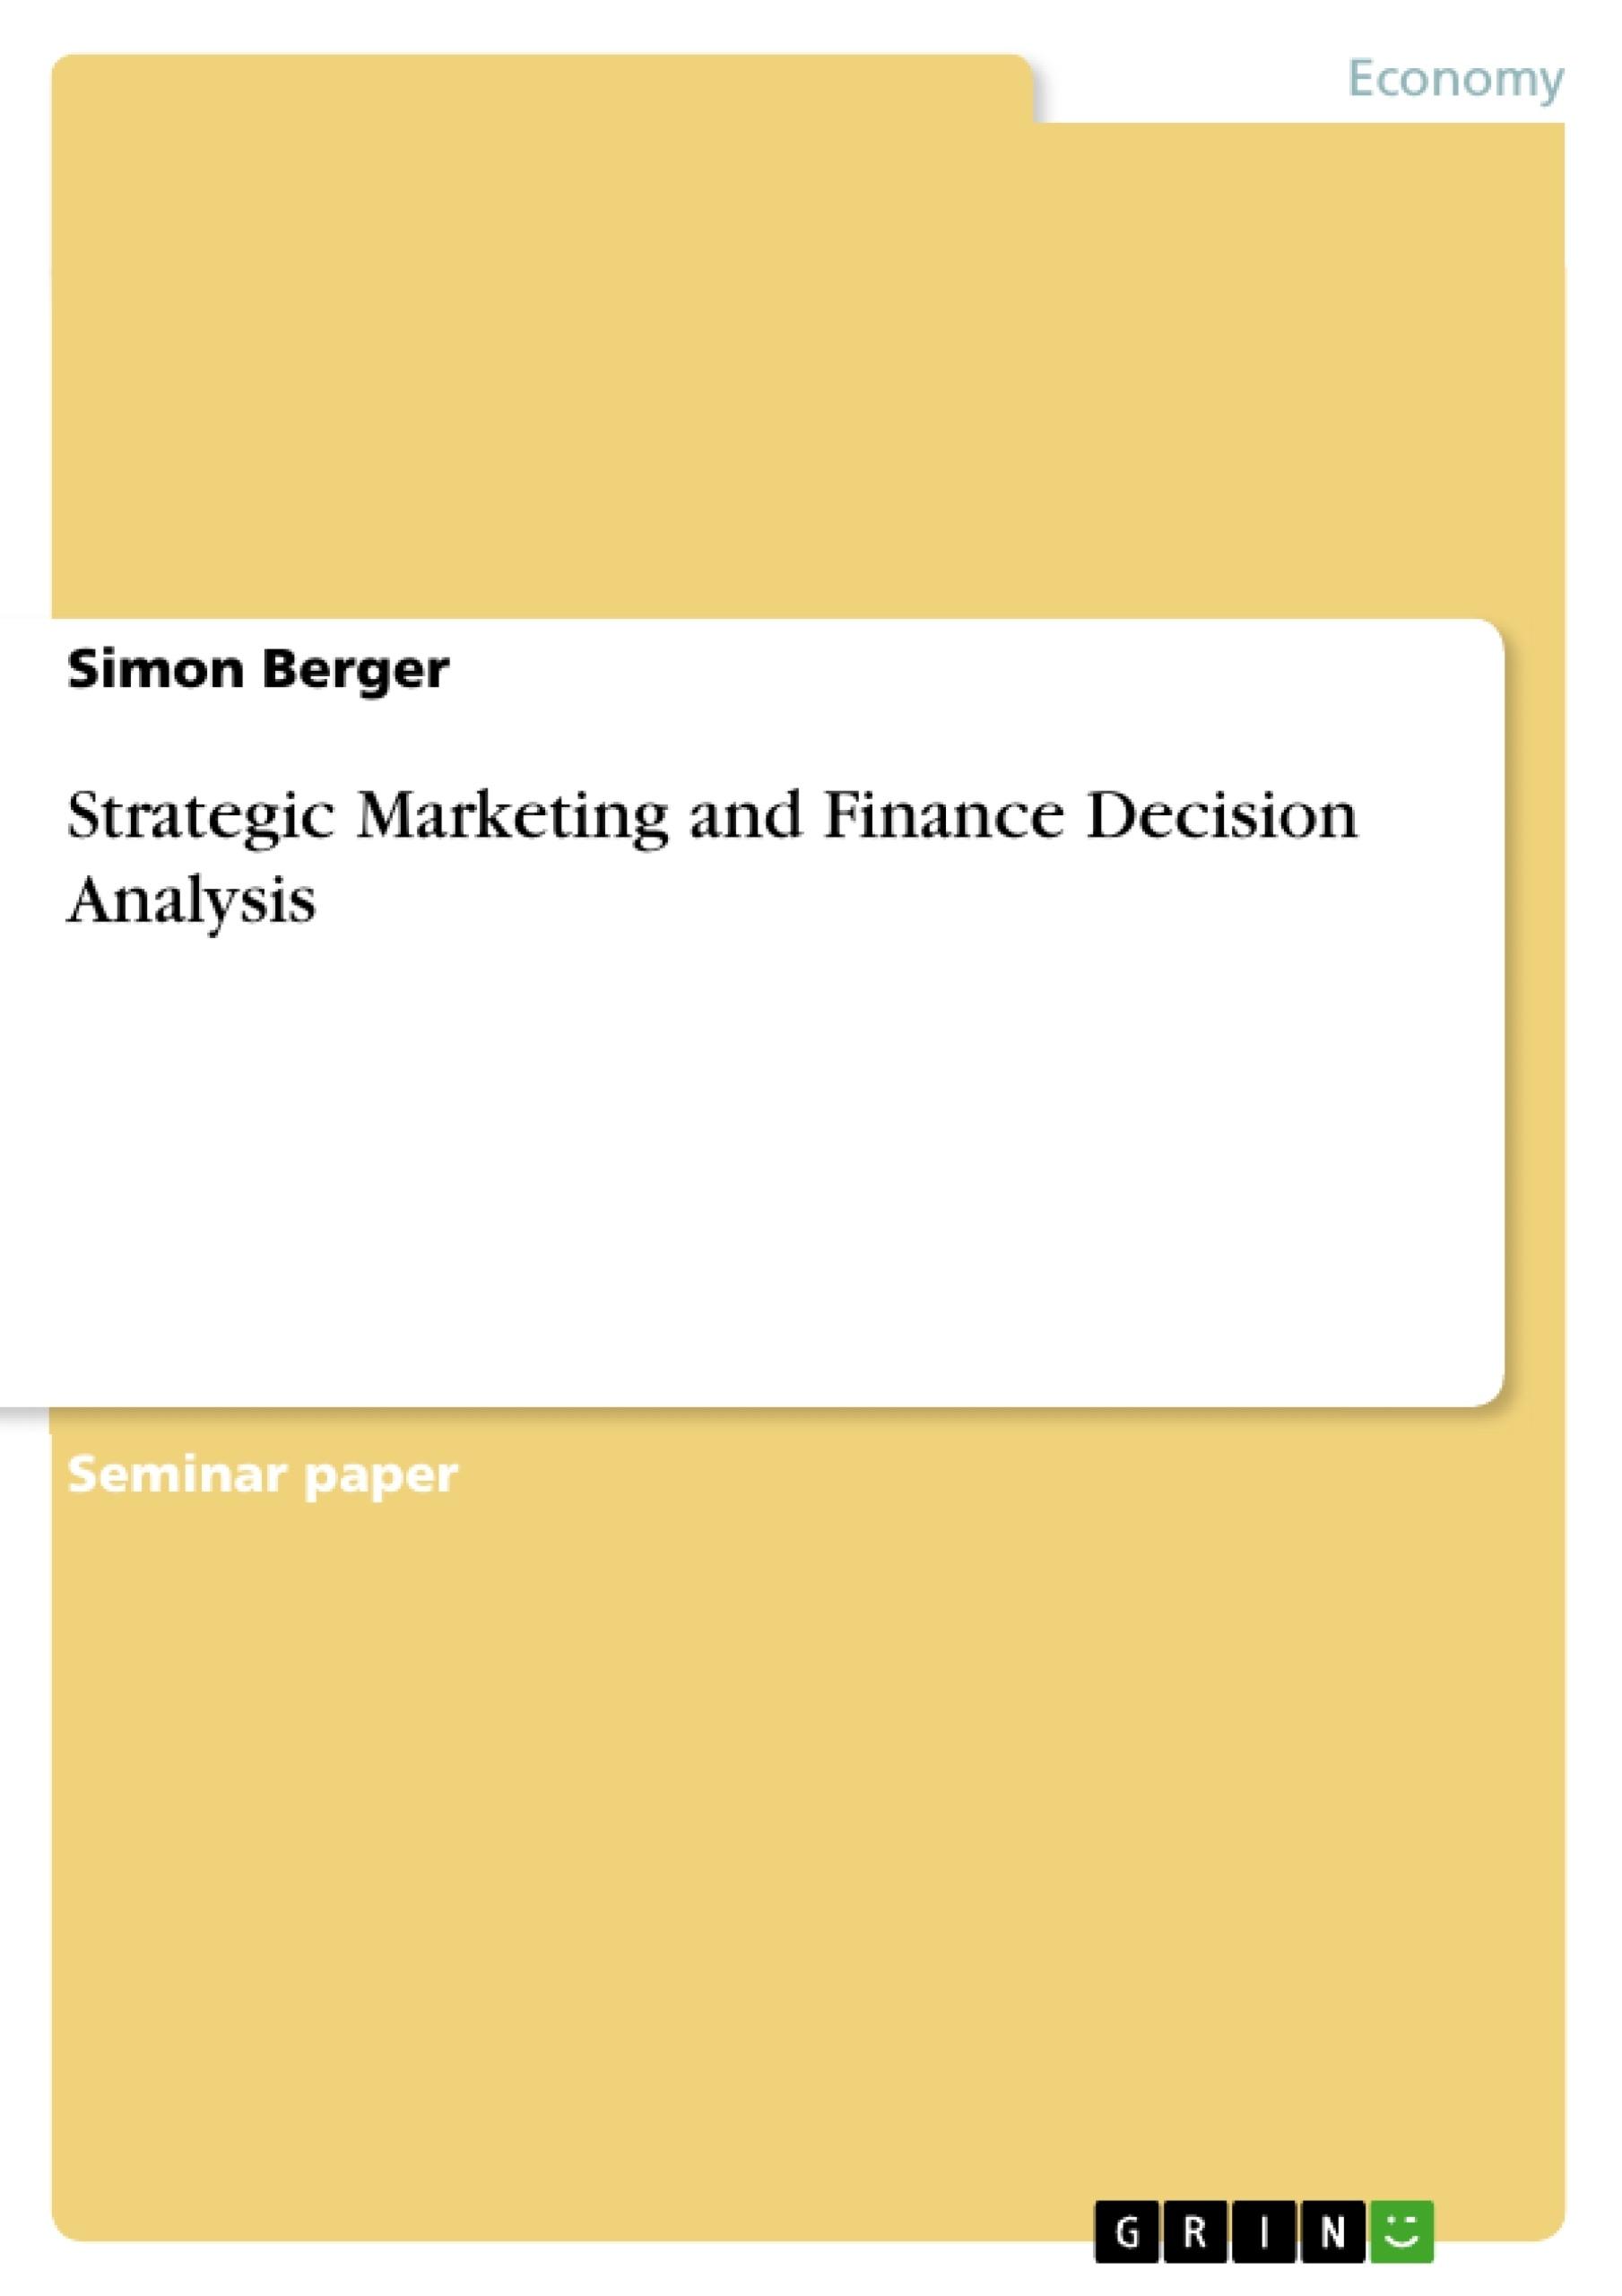 Title: Strategic Marketing and Finance Decision Analysis